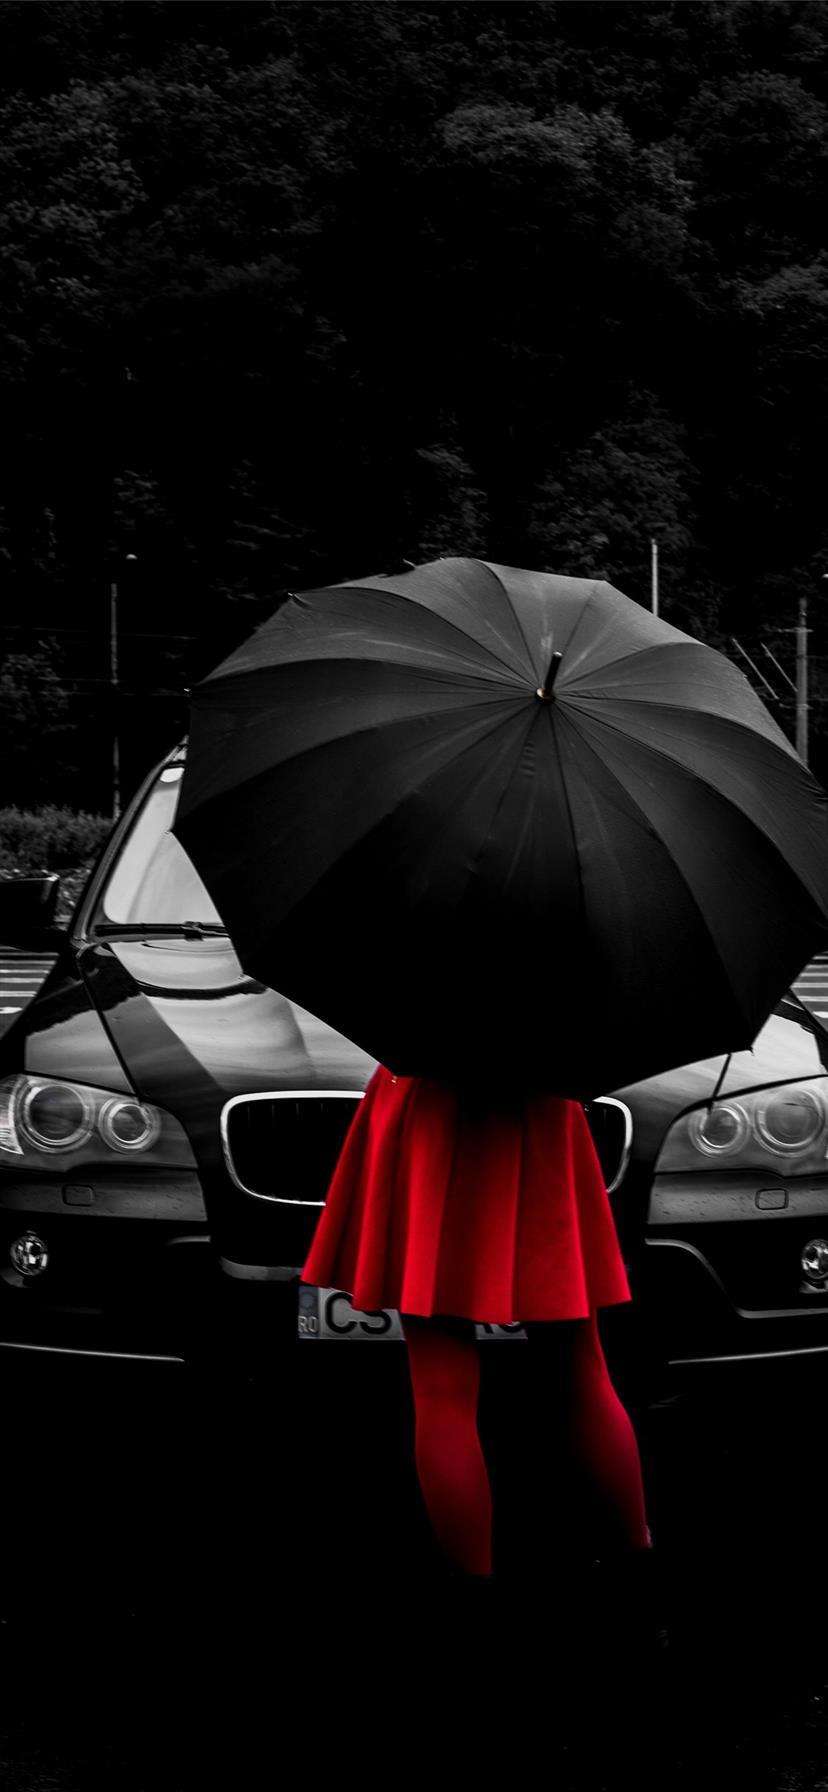 Best Car Iphone 11 Wallpapers Hd Ilikewallpaper